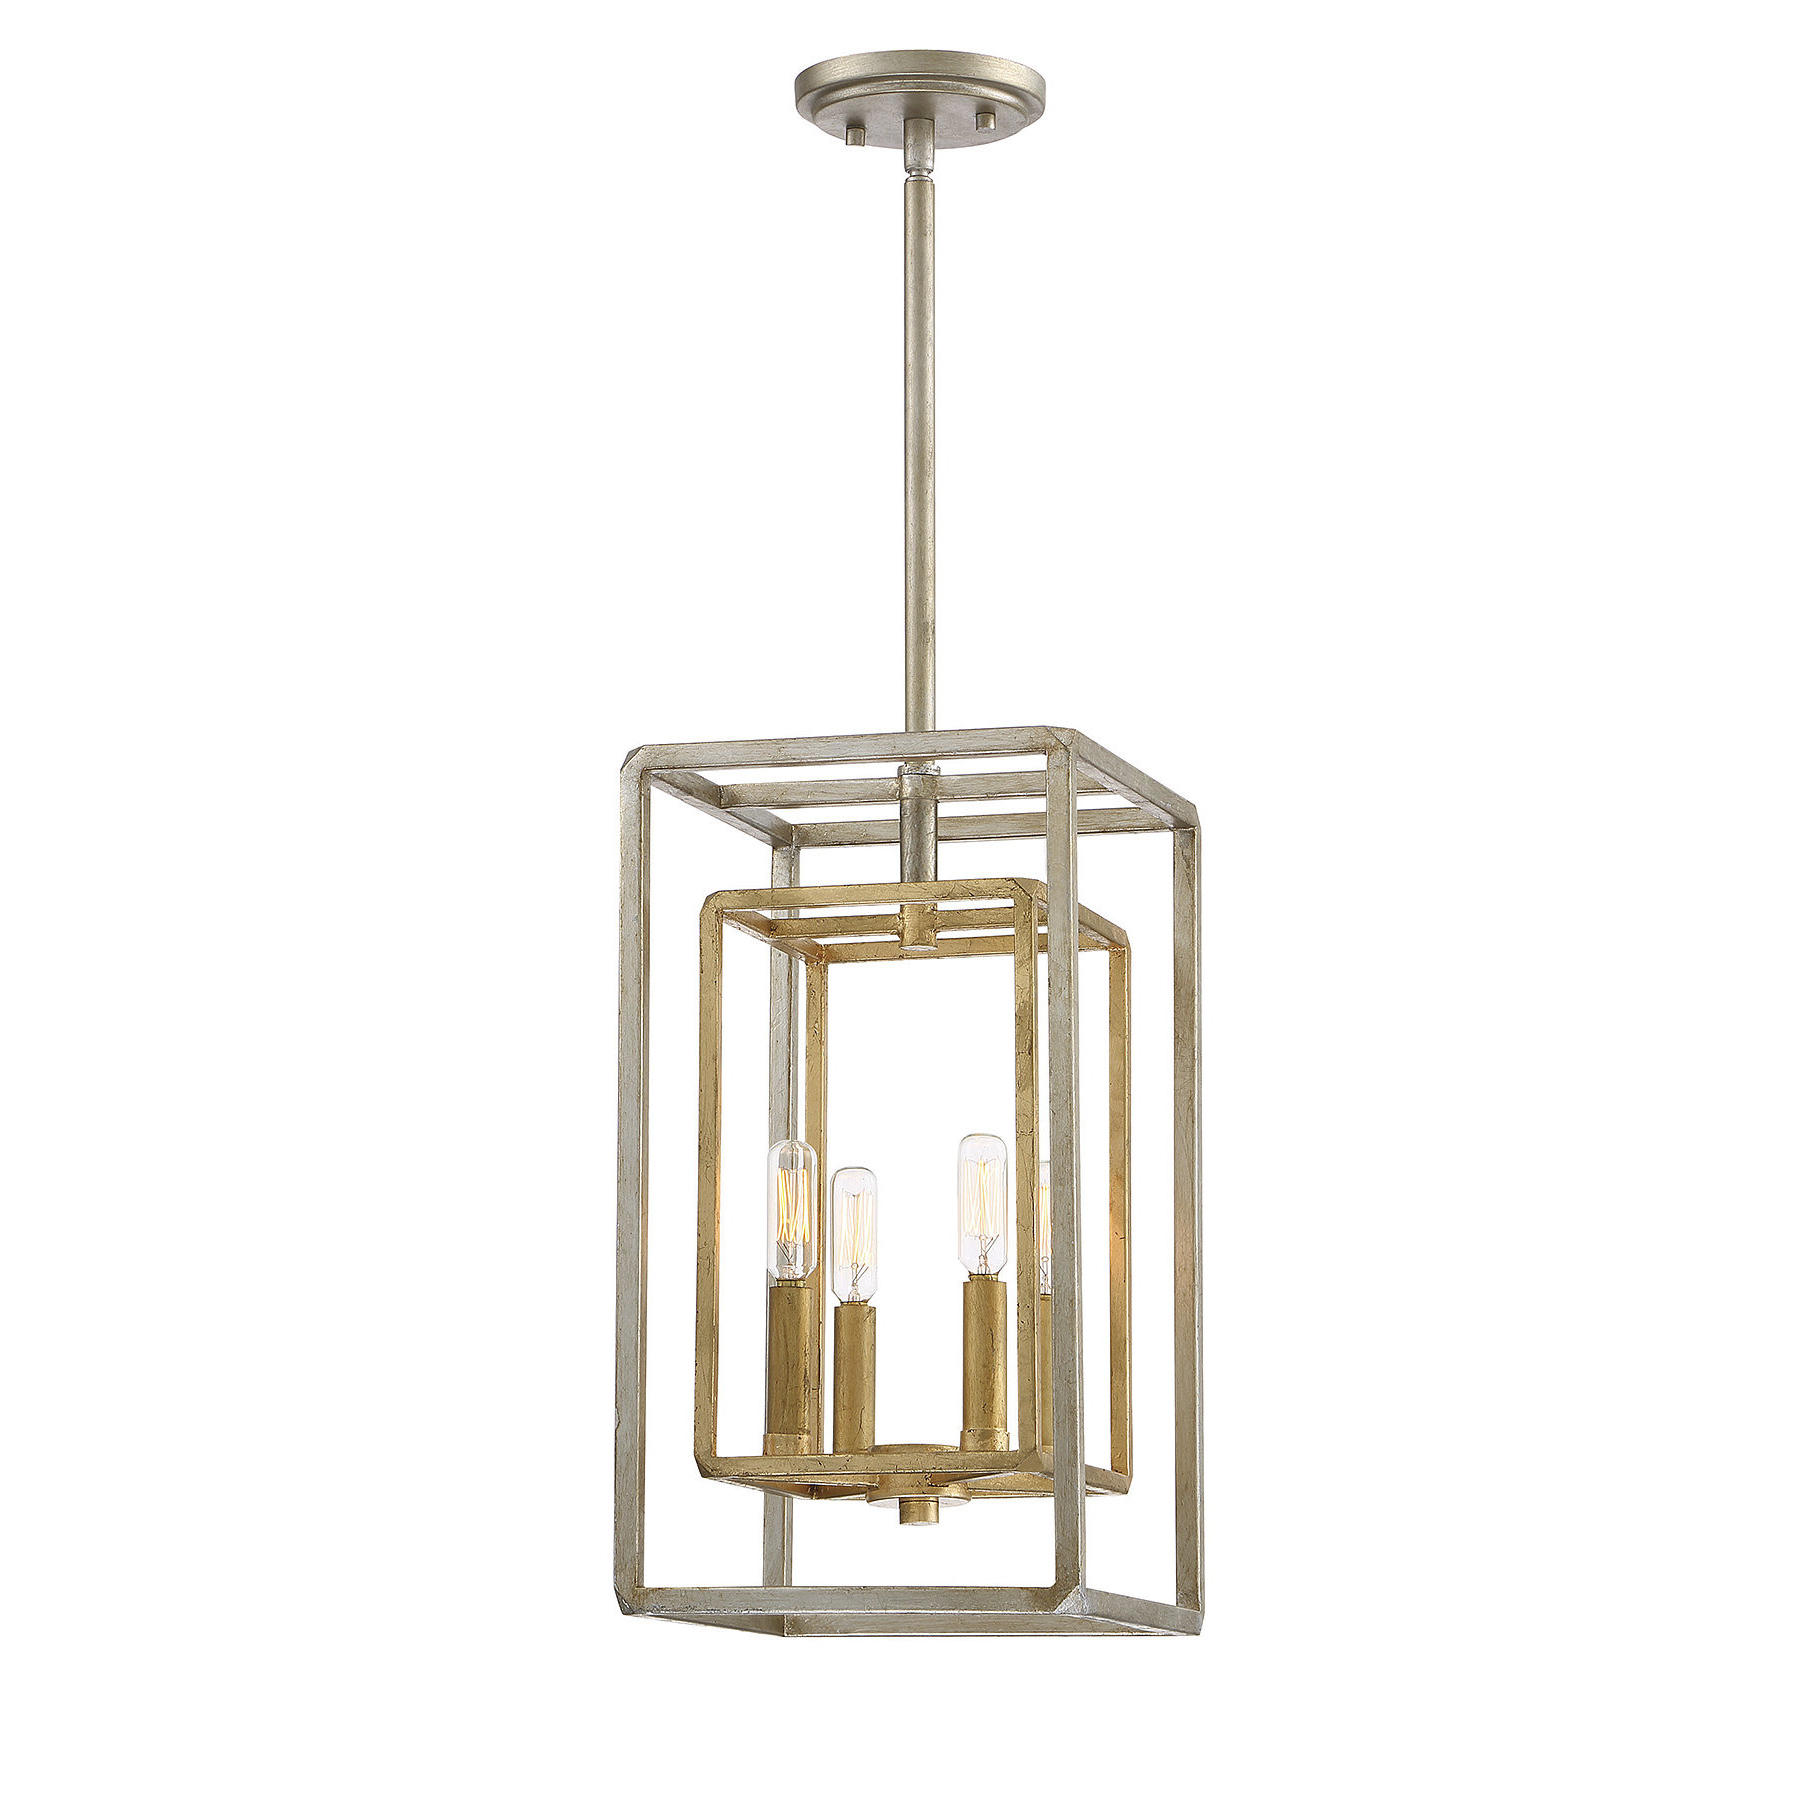 Latest Sherri Ann 3 Light Lantern Square / Rectangle Pendants With Regard To Eglantina 4 Light Lantern Square / Rectangle Pendant (Gallery 12 of 20)